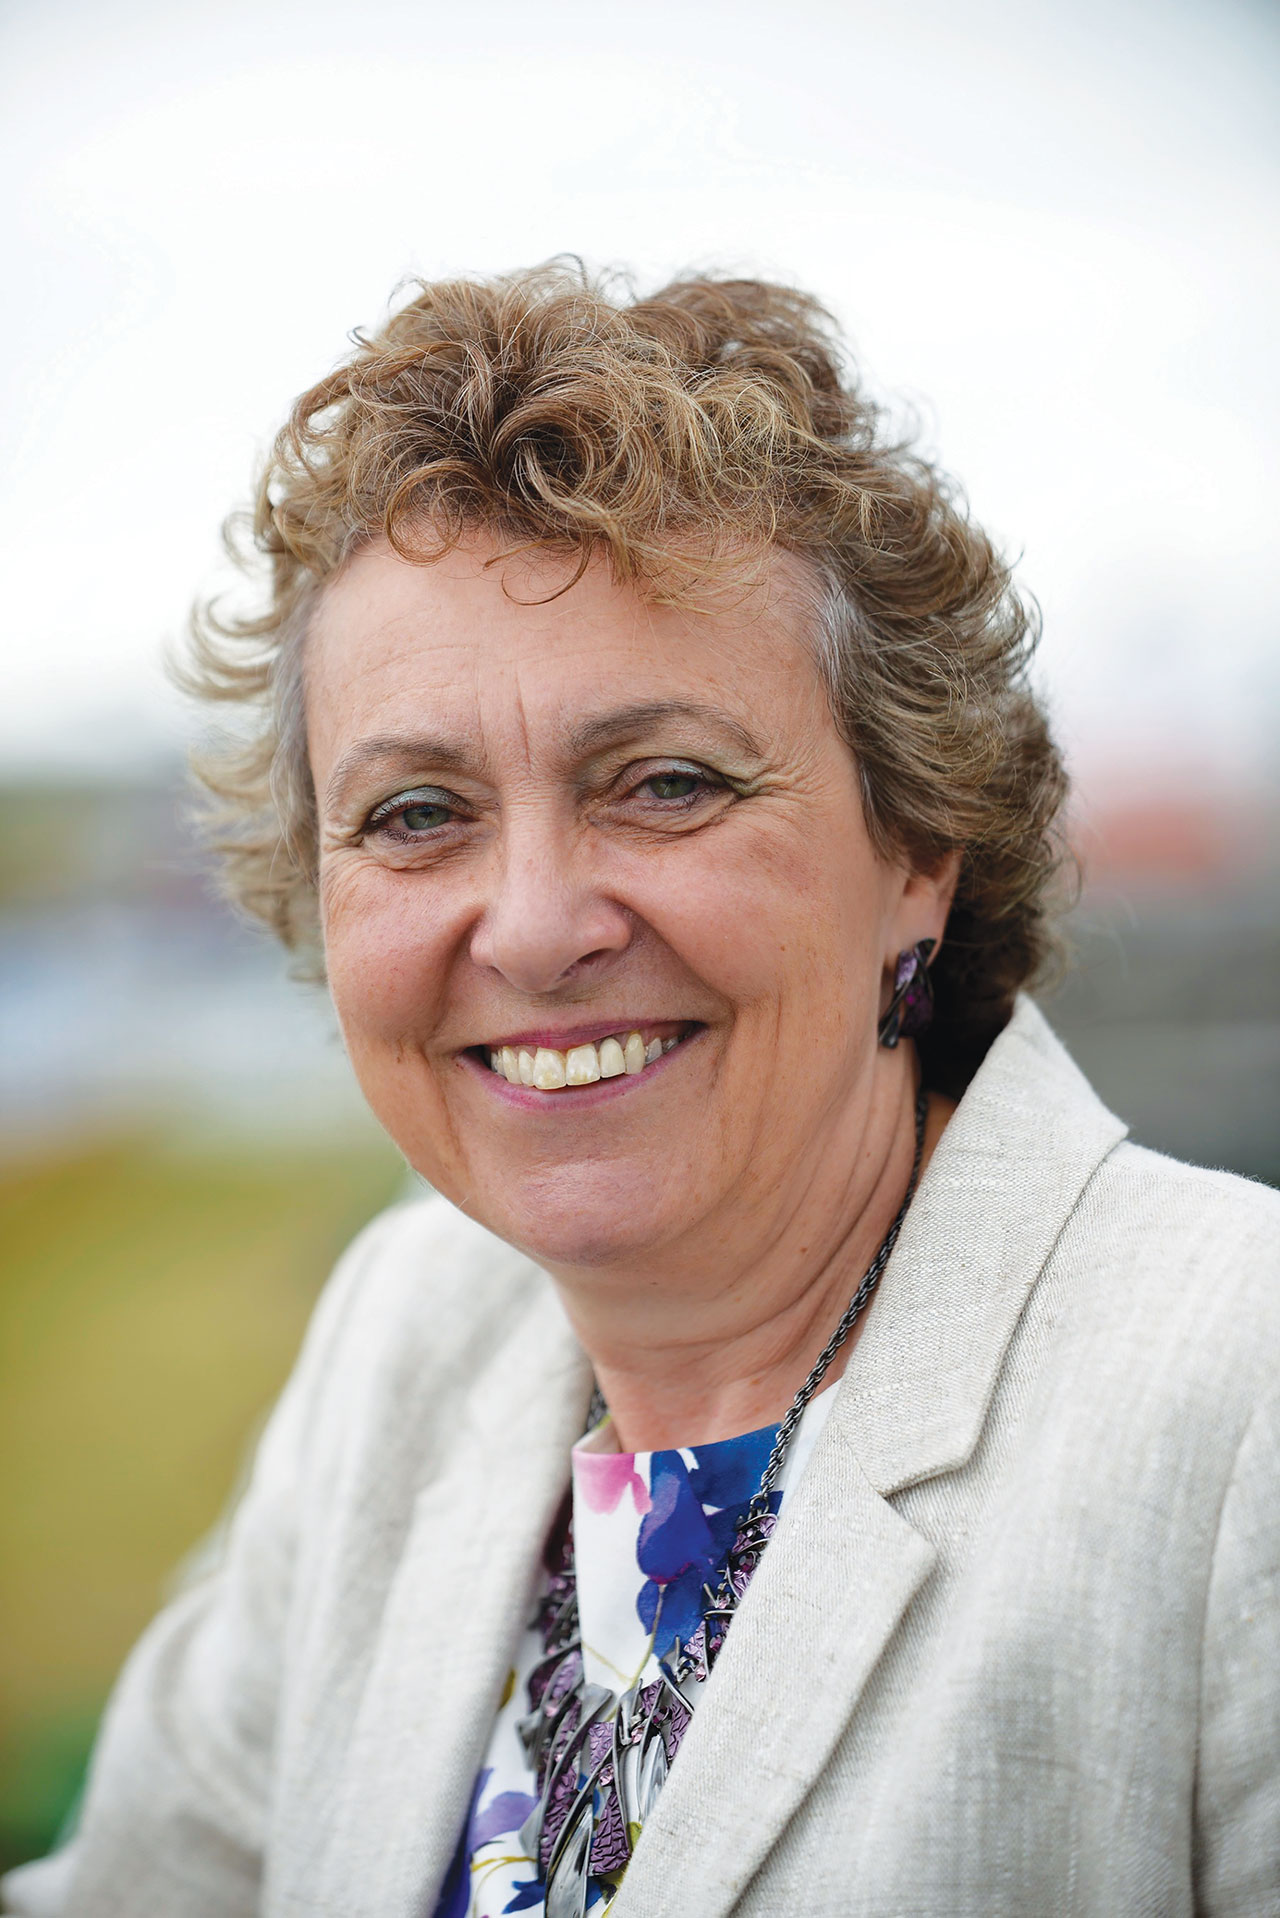 Kathy Slack OBE